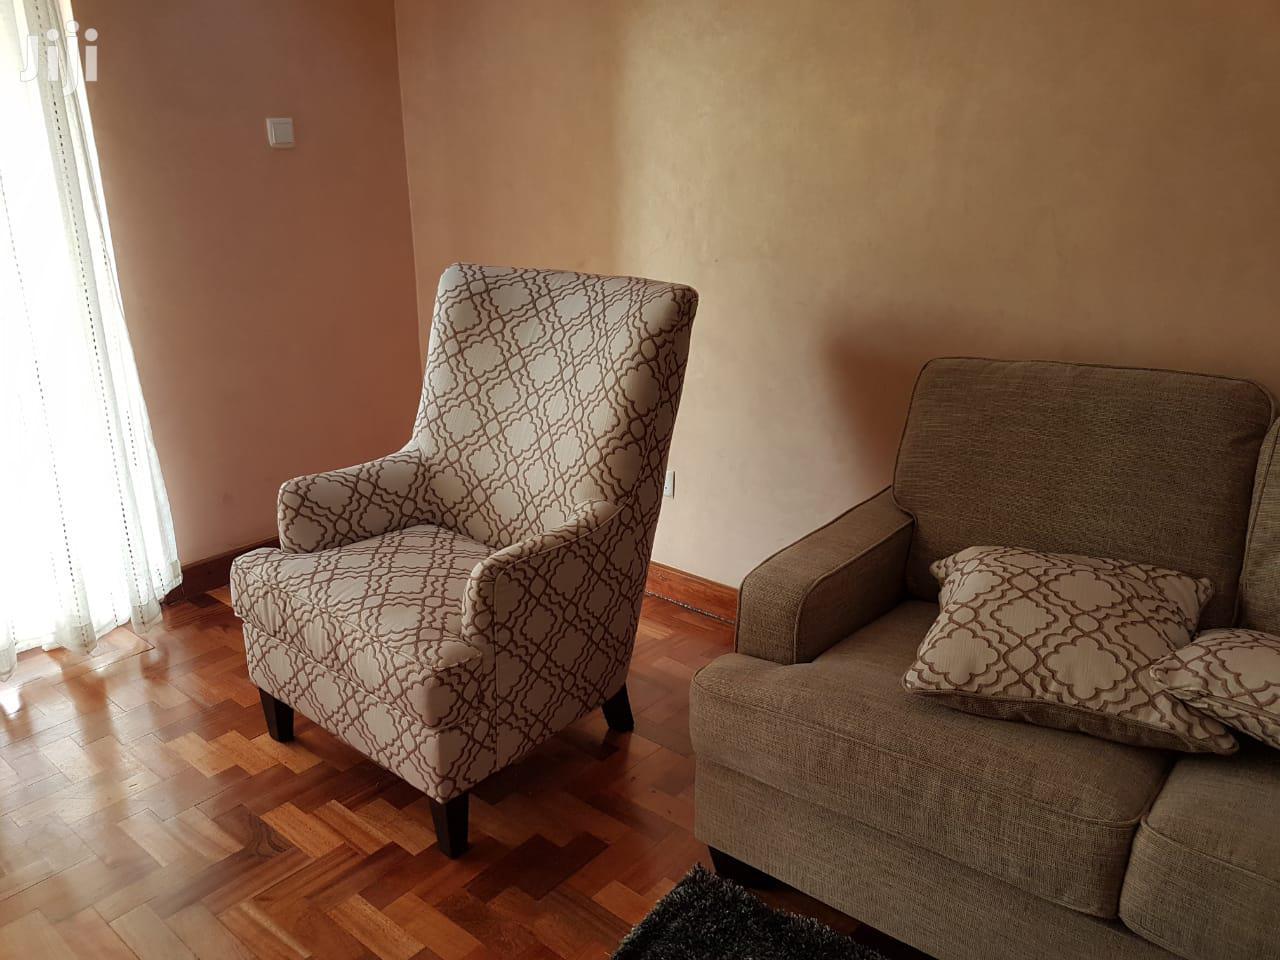 3bdrm With Dsq Kilimani Kenya To Let | Houses & Apartments For Rent for sale in Kilimani, Nairobi, Kenya